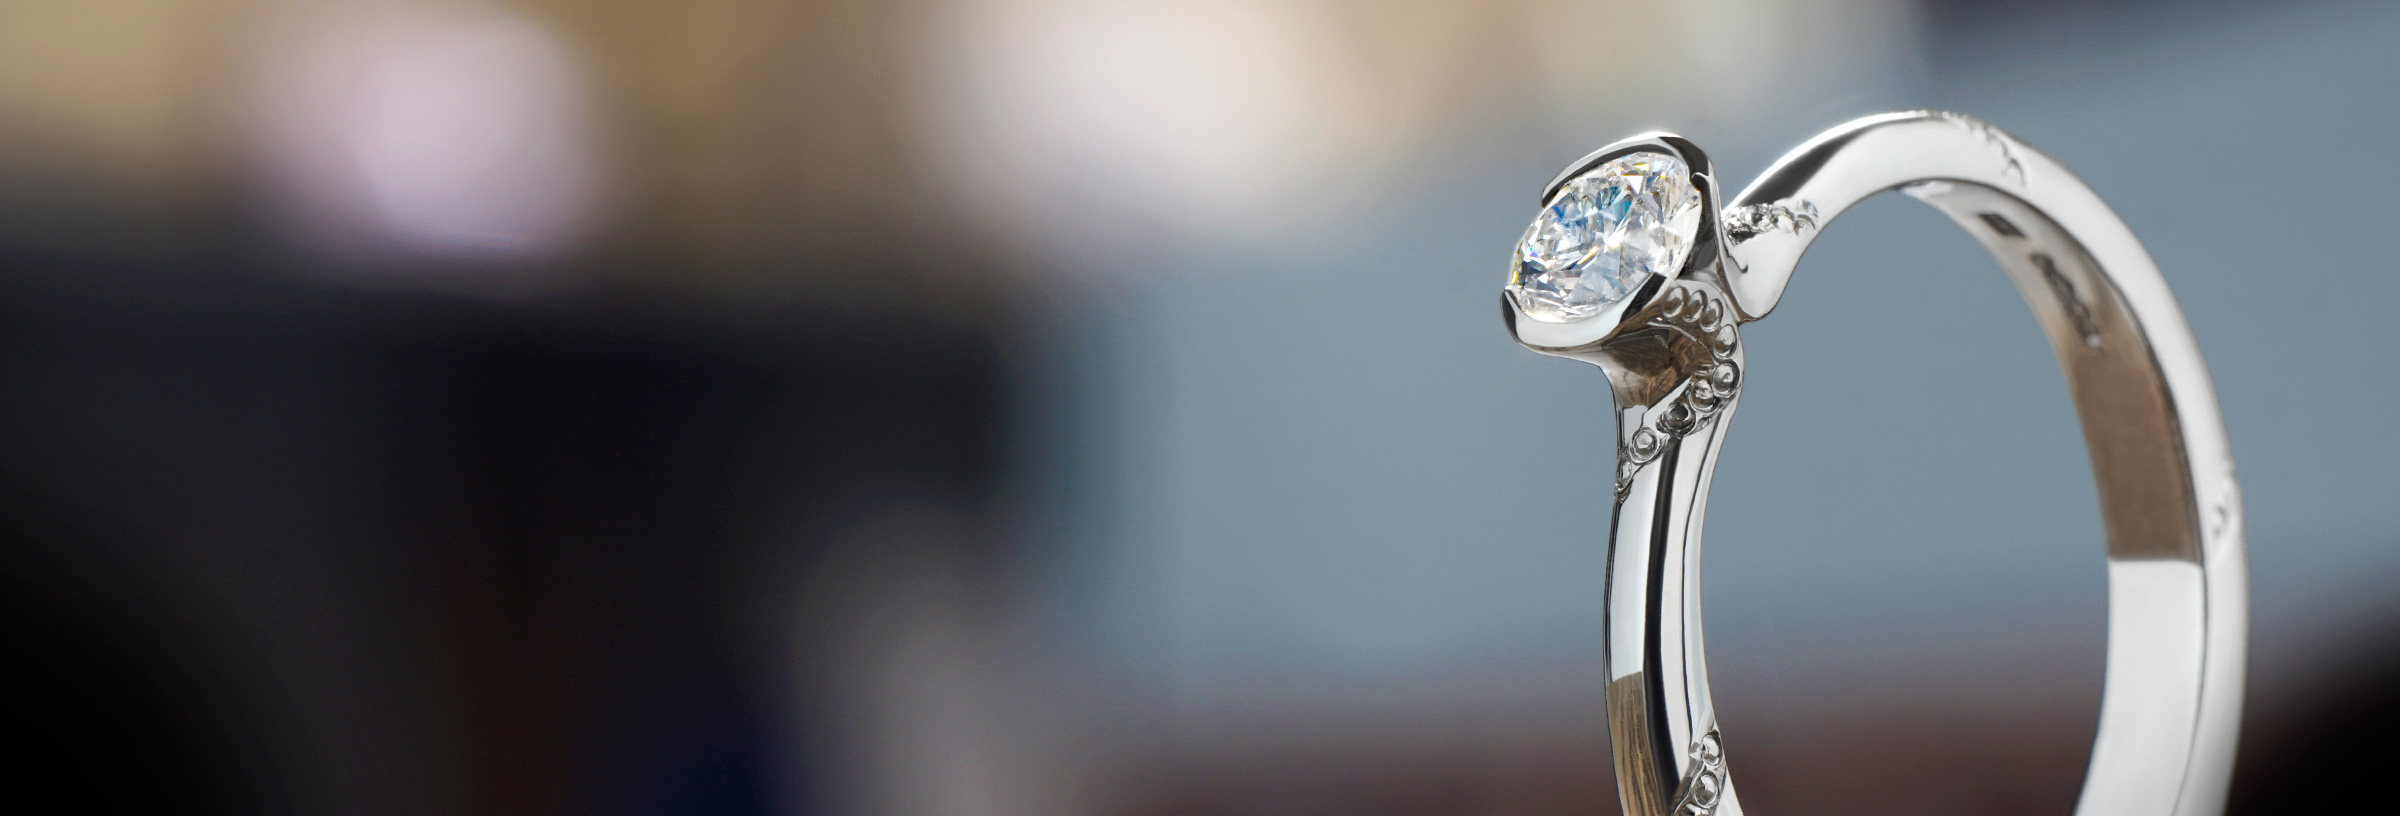 Patterned Engraved Engagement Rings Harriet Kelsall